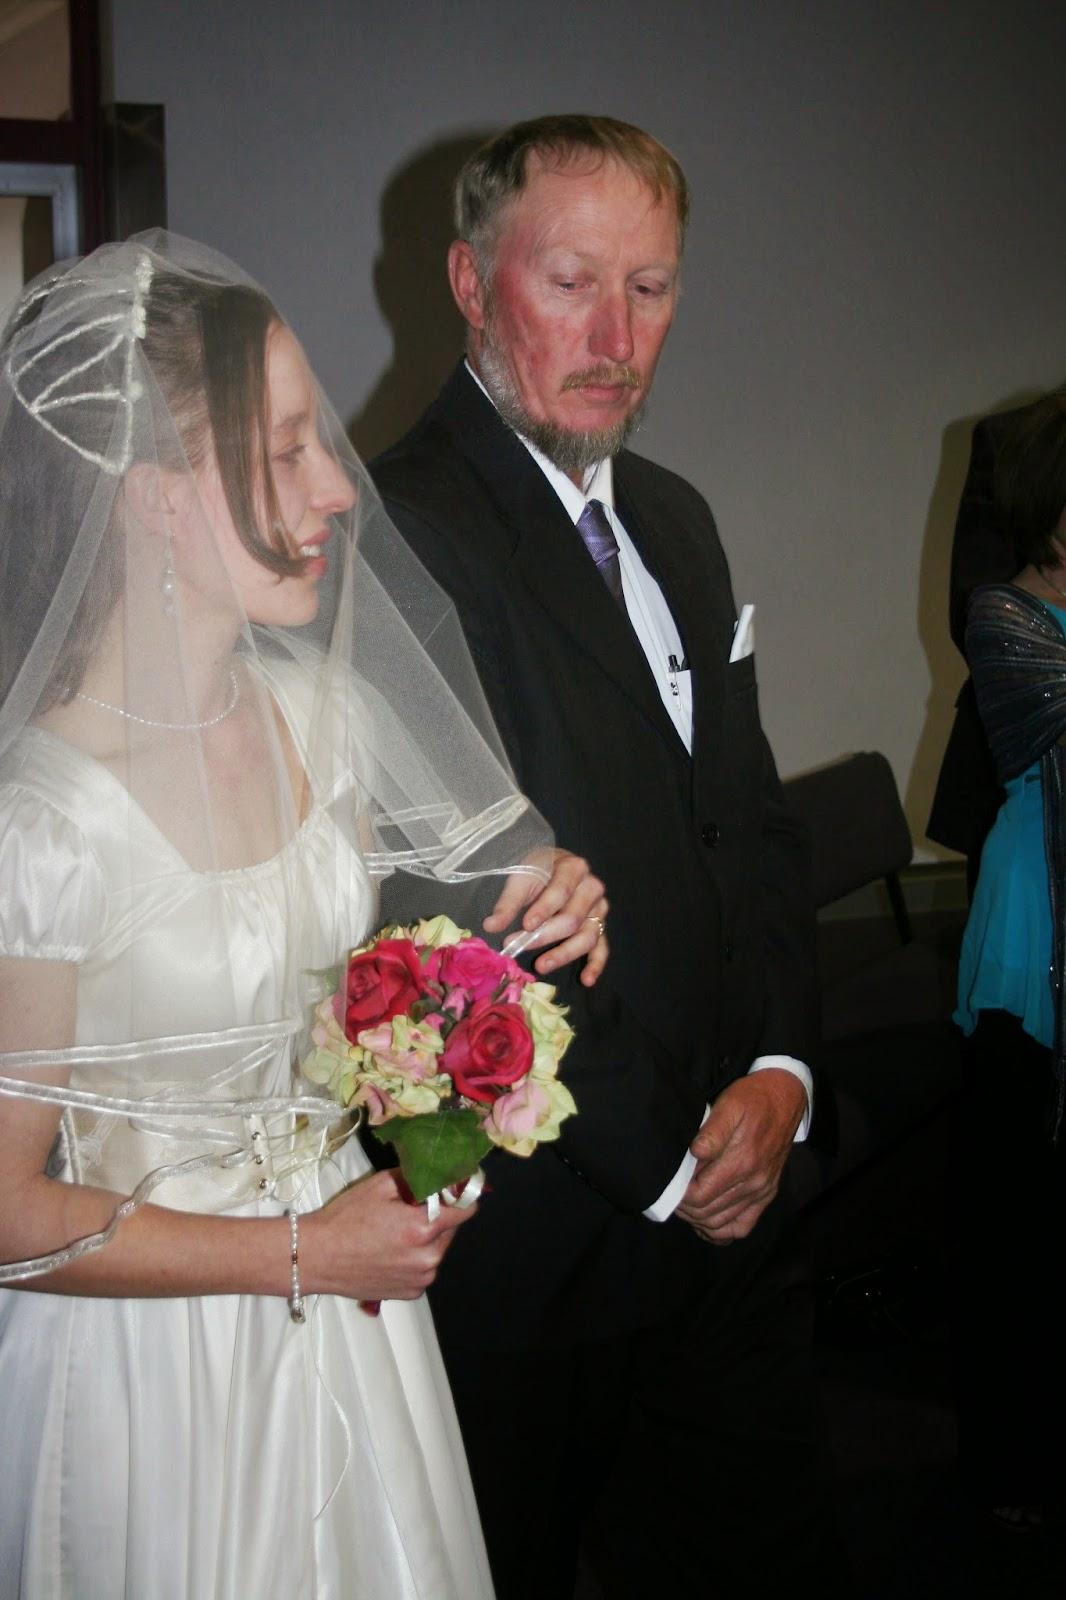 Our Crazy Wedding & Jewish Betrothal - Lizzy Ainsworth Books